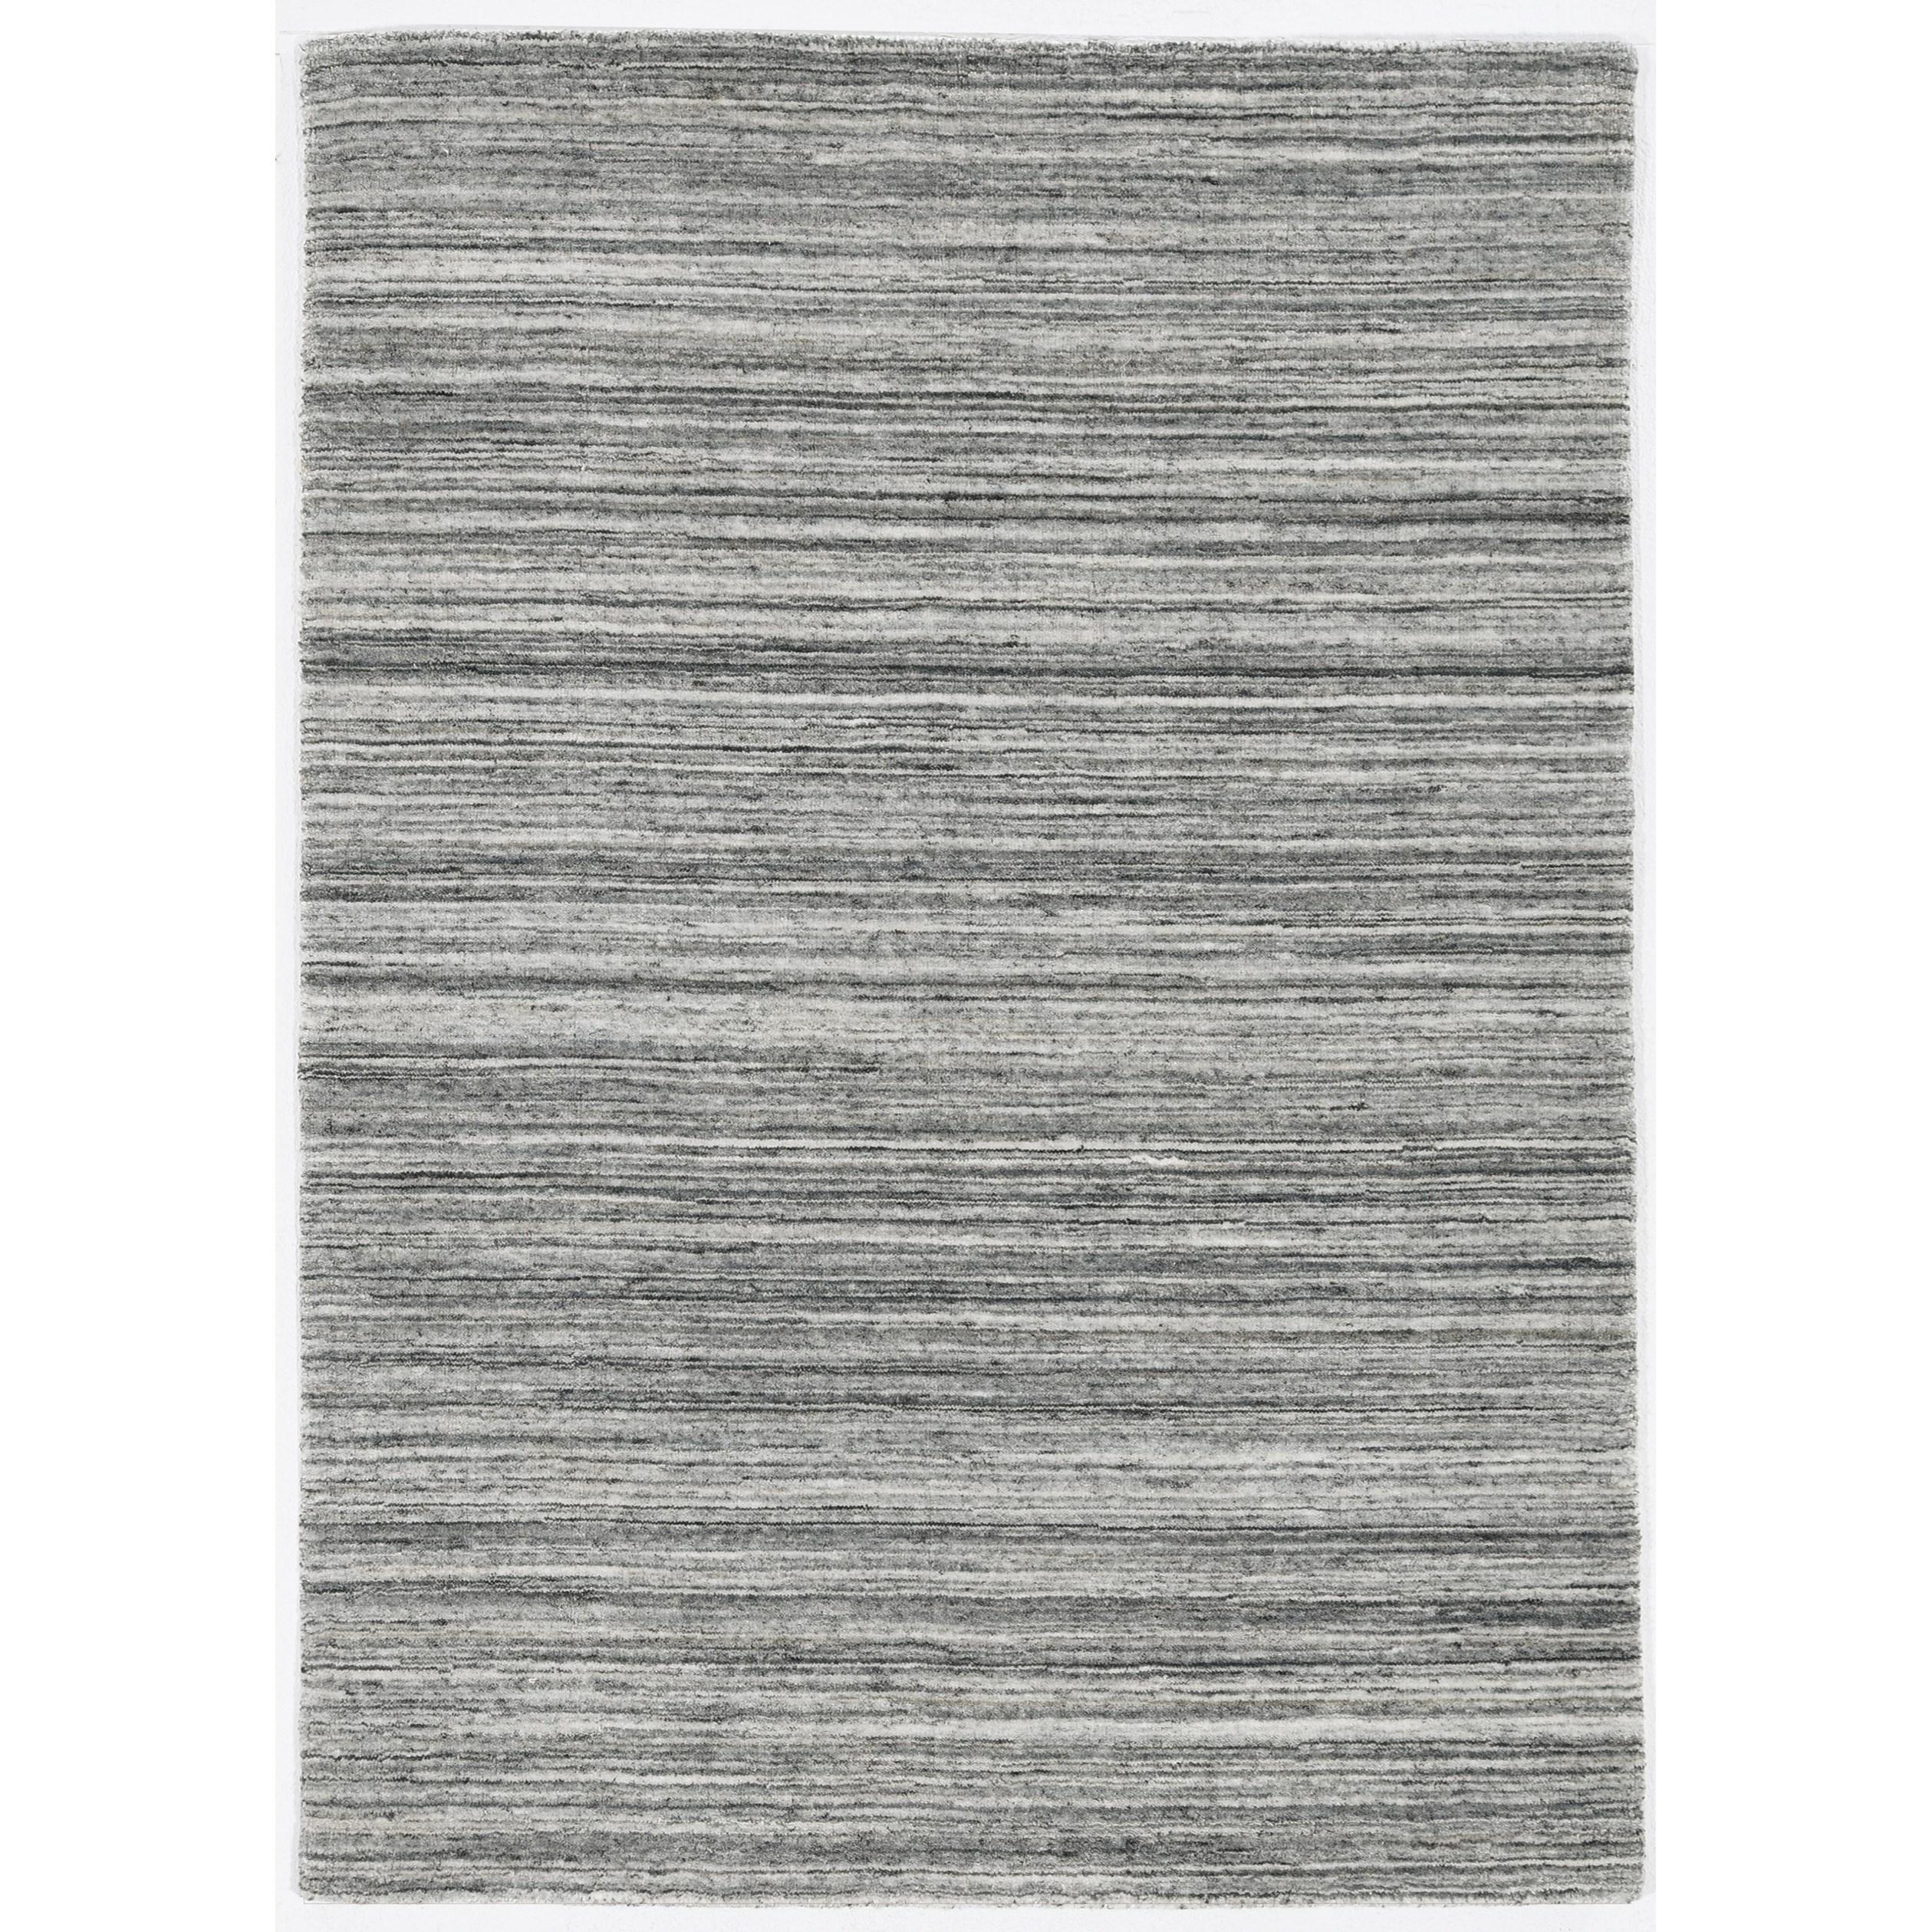 Dune 8' x 10' Grey Villa Rug by Kas at Darvin Furniture